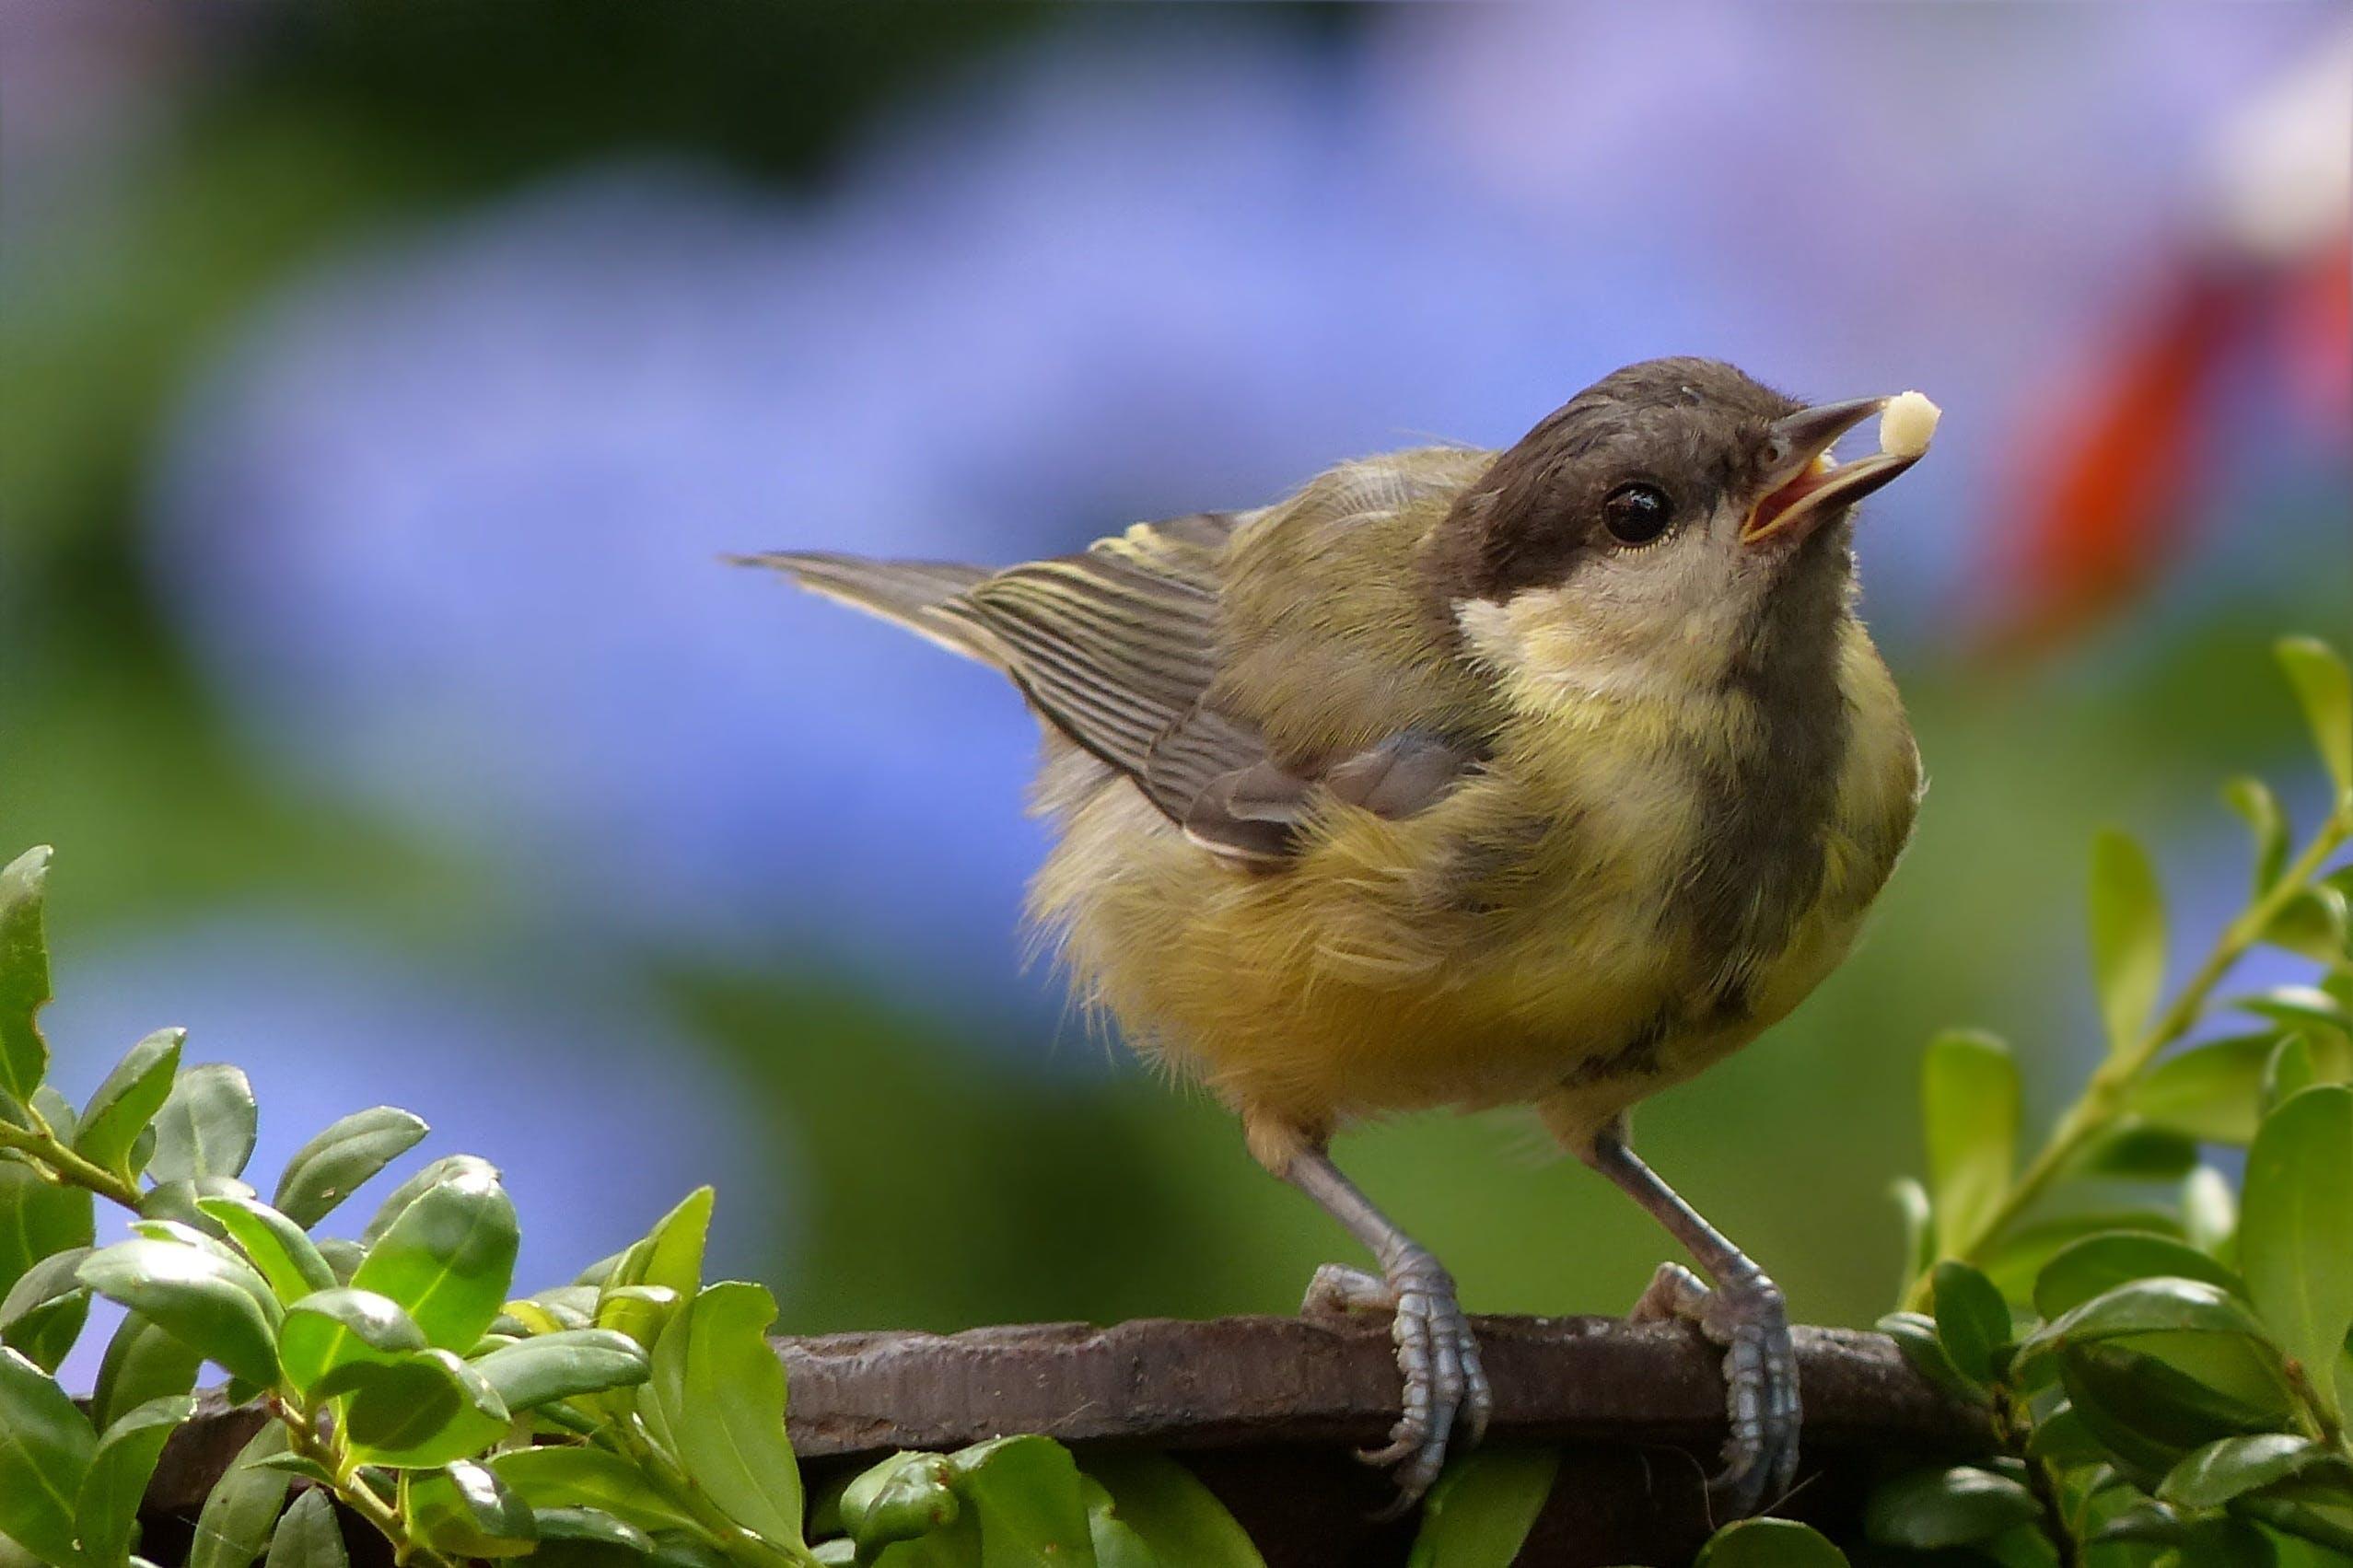 Yellow Brown Bird Perch on Tree